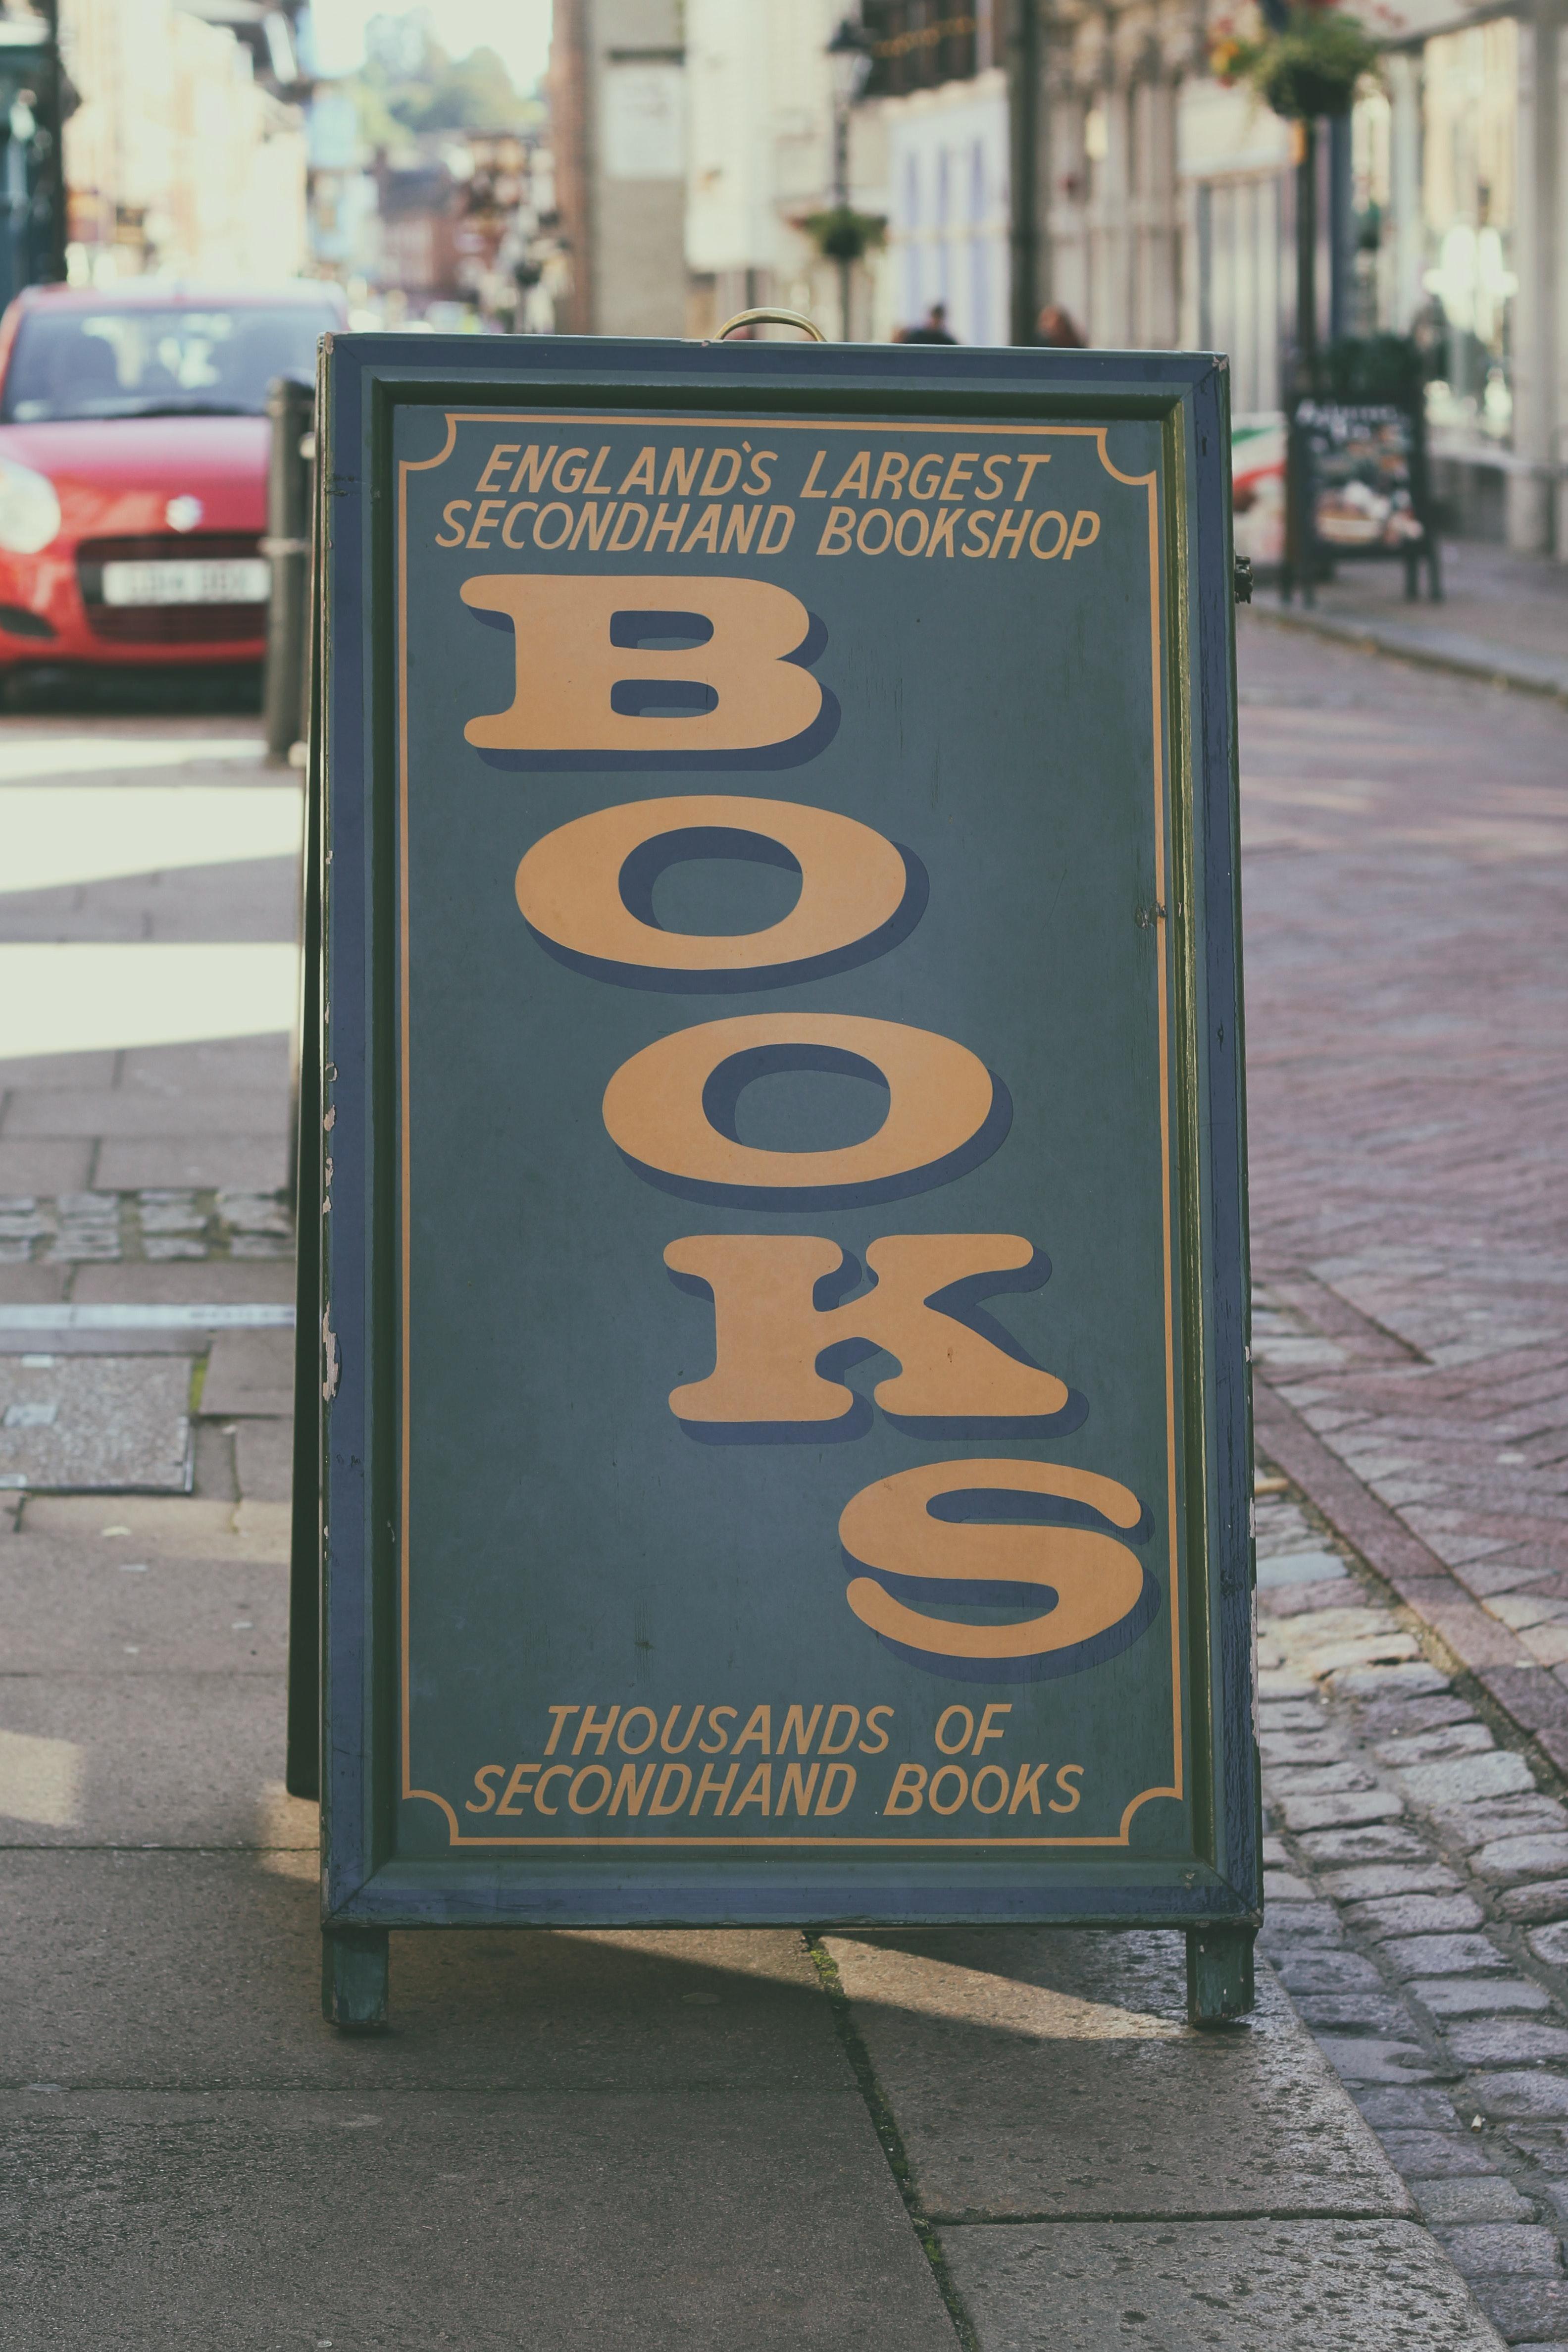 Books Signage, Pavement, Transportation system, Street, Stores, HQ Photo